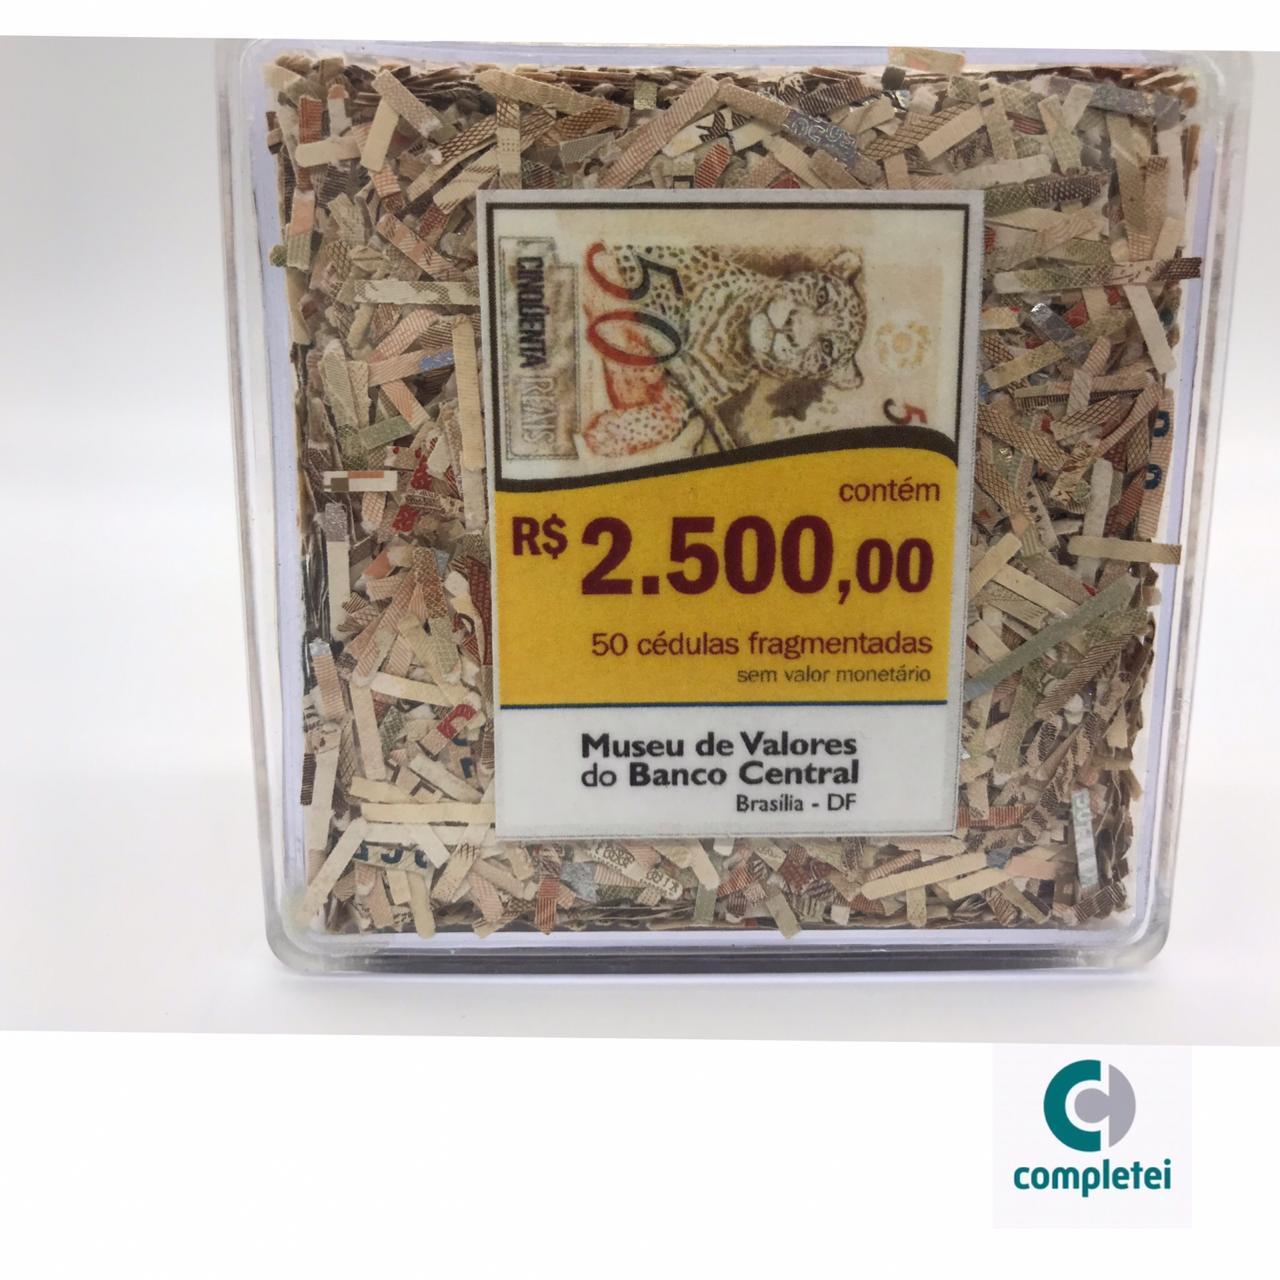 CEDULAS FRAGMENTADAS DE 50,00 ESPECIAL DO MUSEU DE VALORES DO BANCO CENTRAL